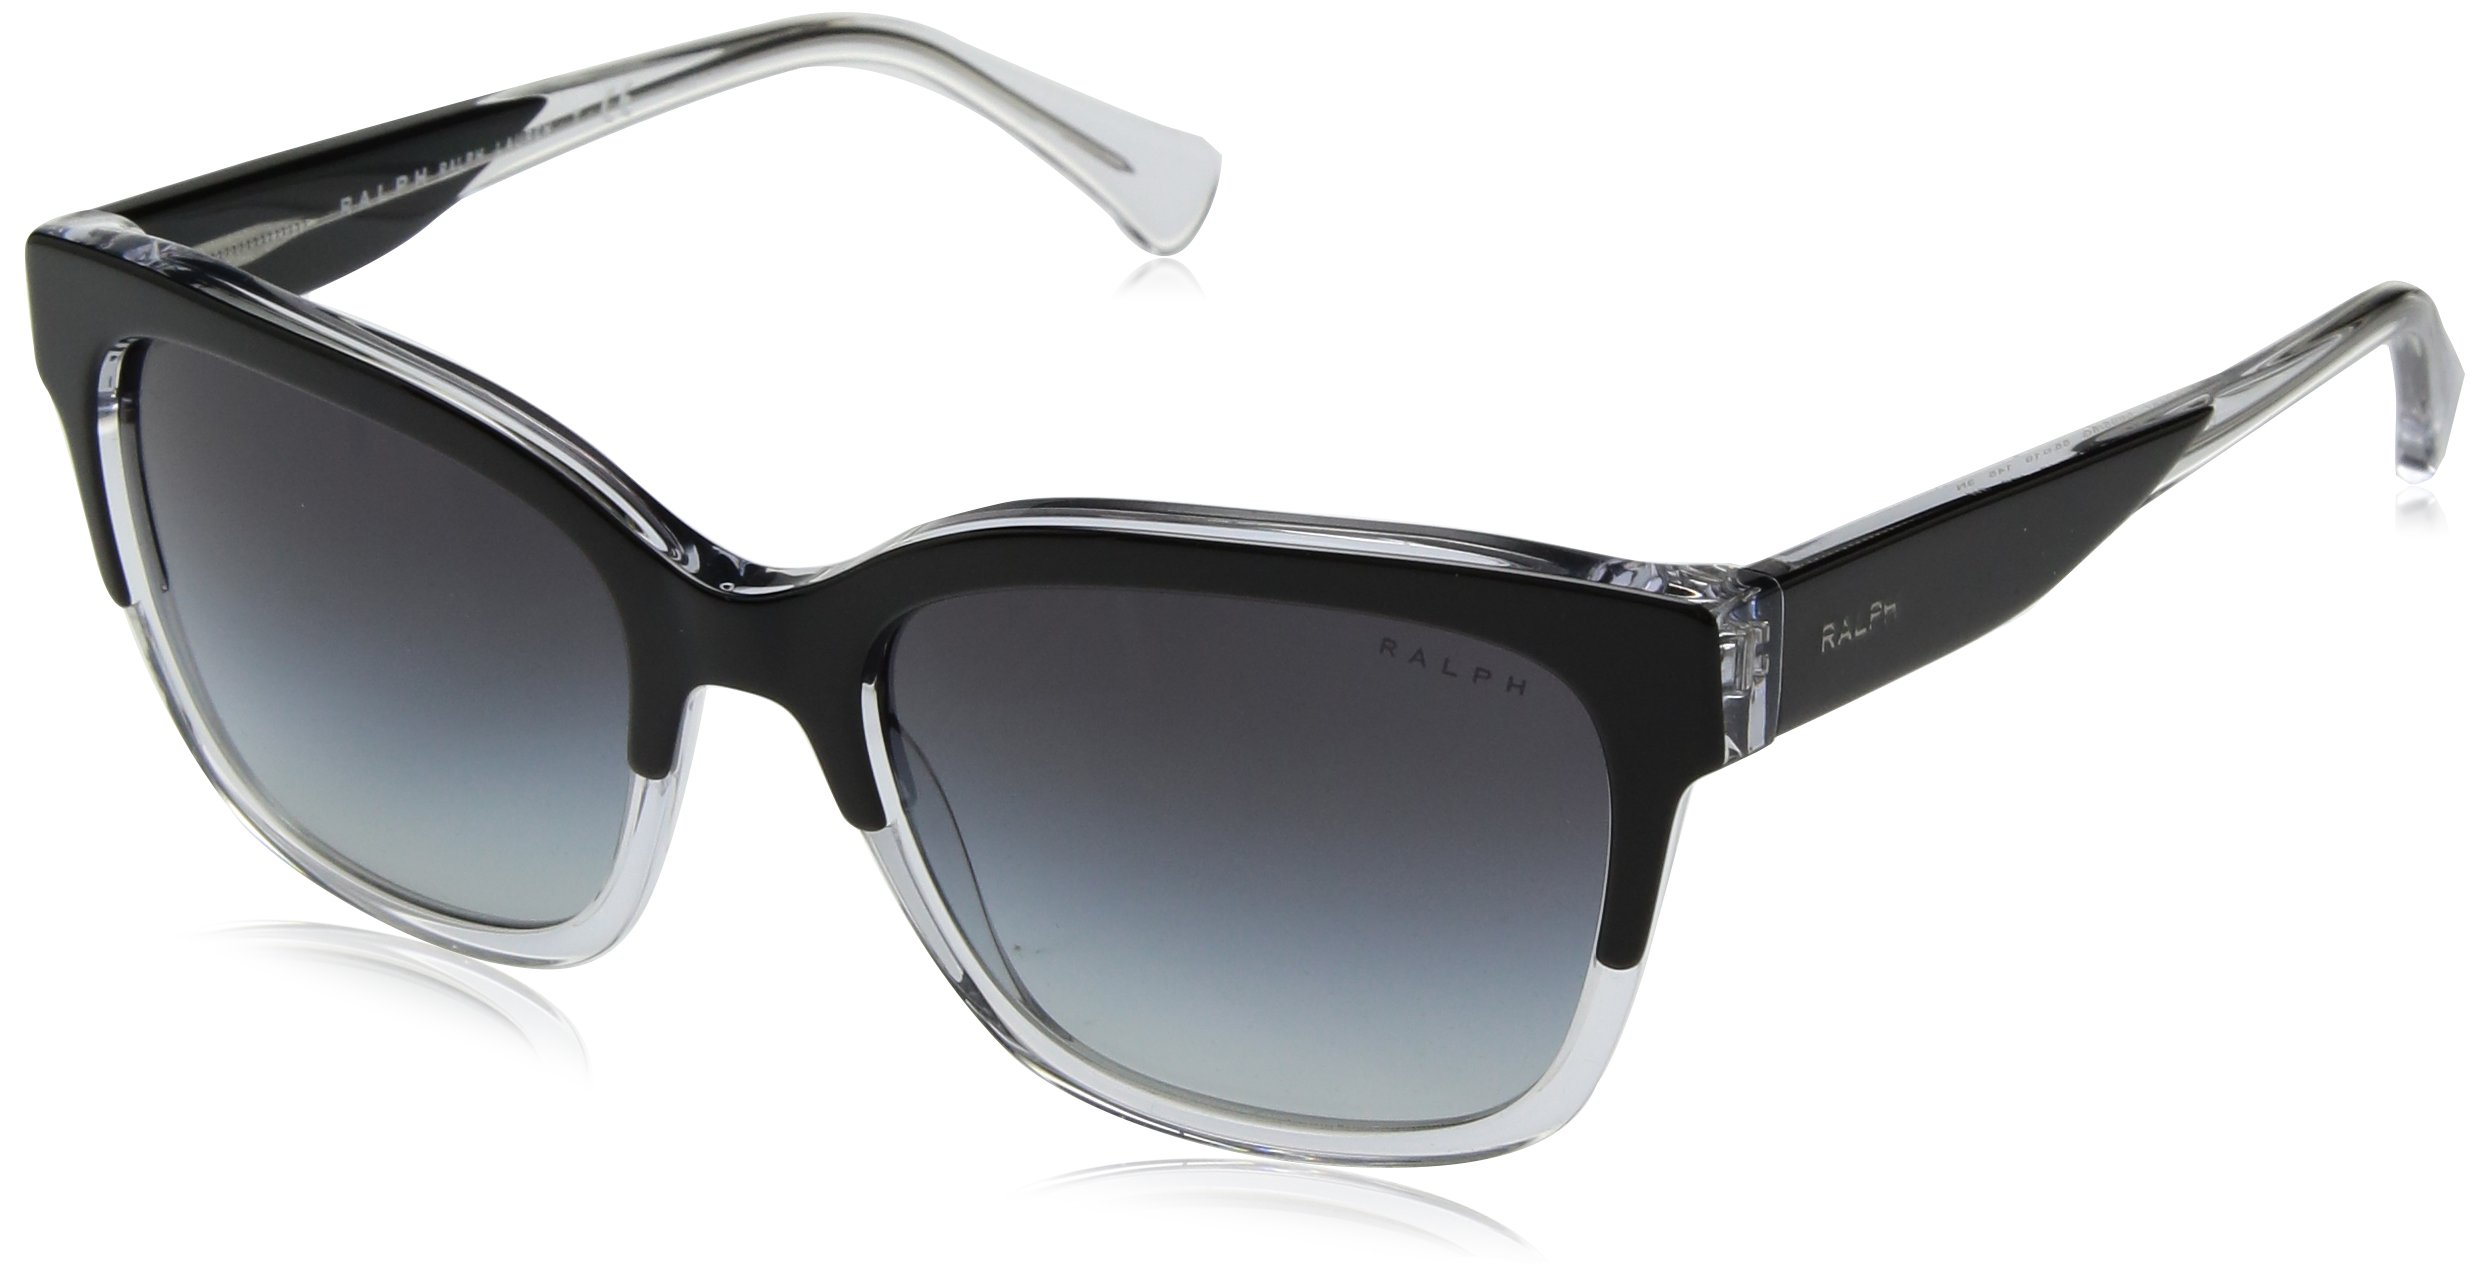 Ralph by Ralph Lauren Women's 0ra5247 Square Sunglasses, Top Black/Crystal, 55.0 mm